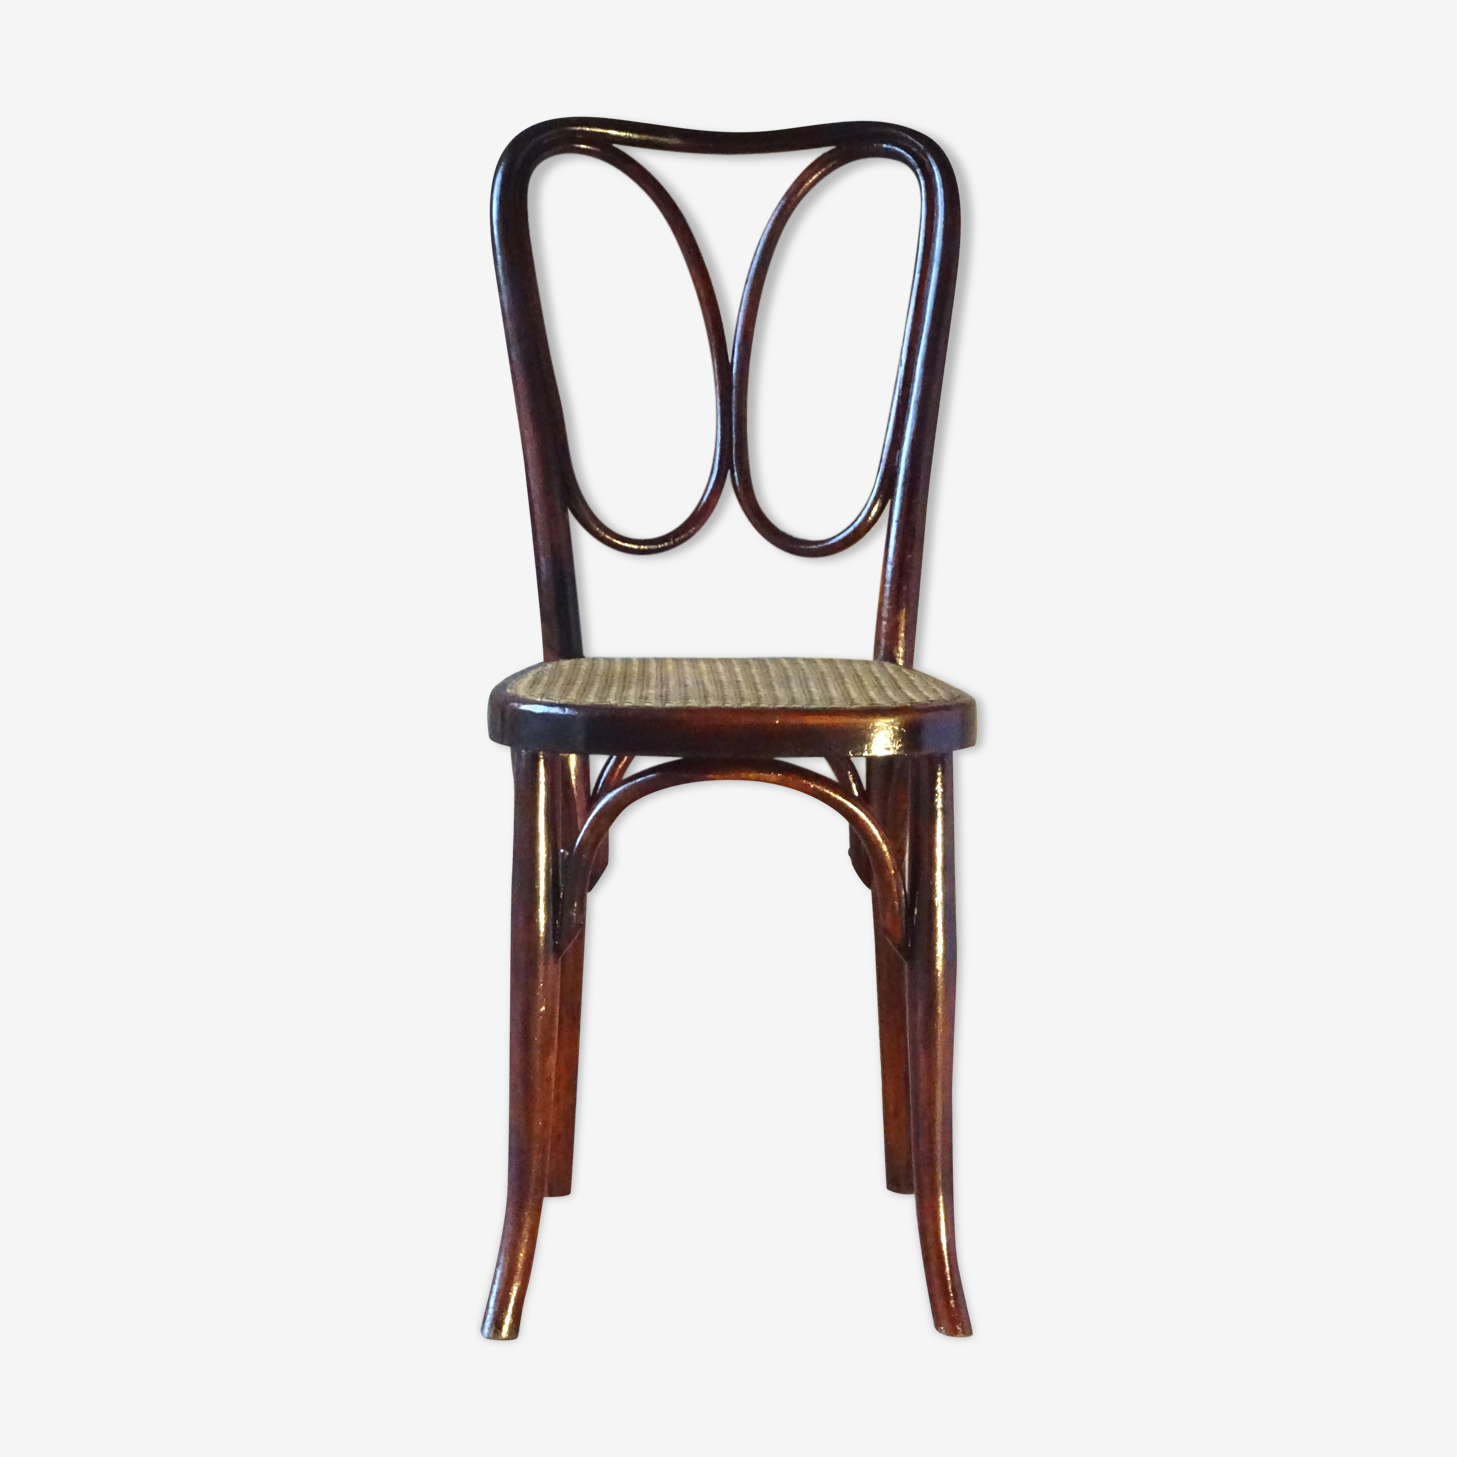 Chair Bistro Chania Kohn No. 243 1/2 1905-very nice condition